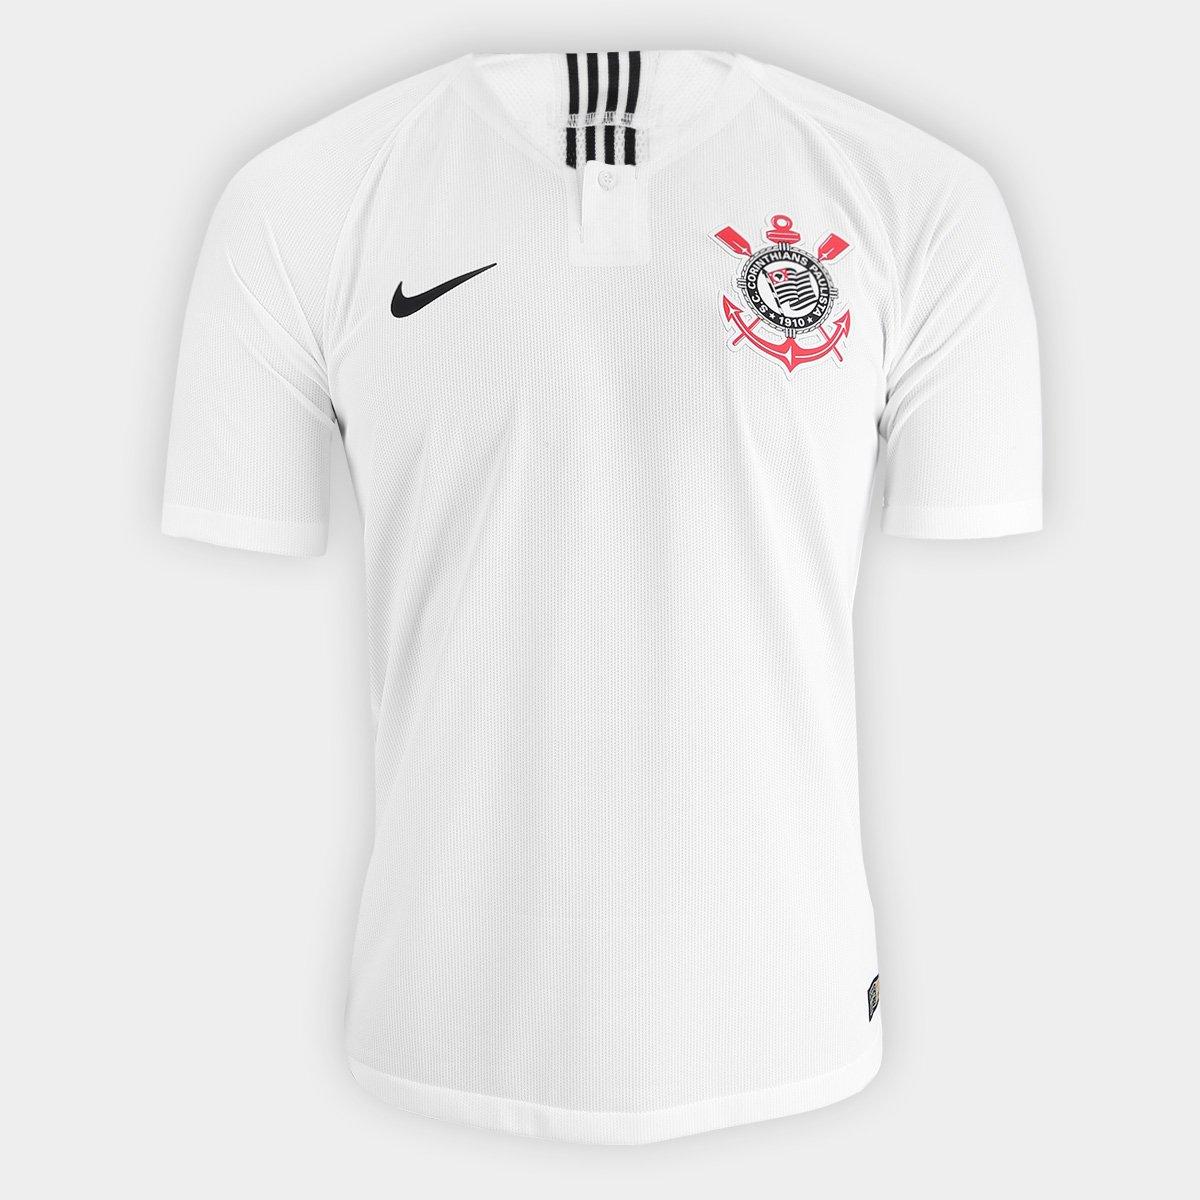 Camisa Corinthians I 2018 s n° - Jogador Nike Masculina - Branco e ... fda16f1315238